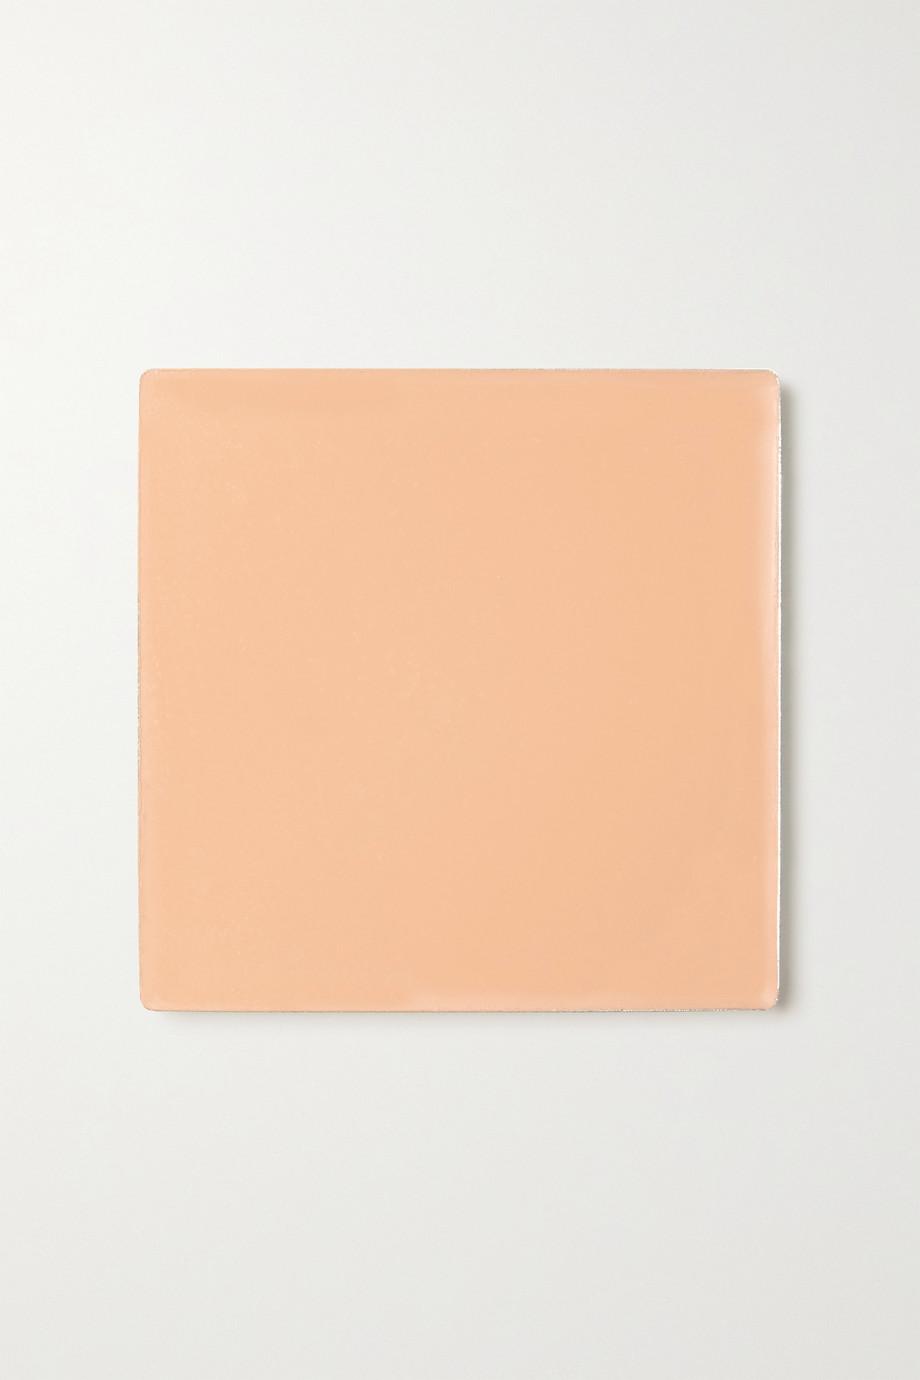 Kjaer Weis Cream Foundation Refill - Paper Thin